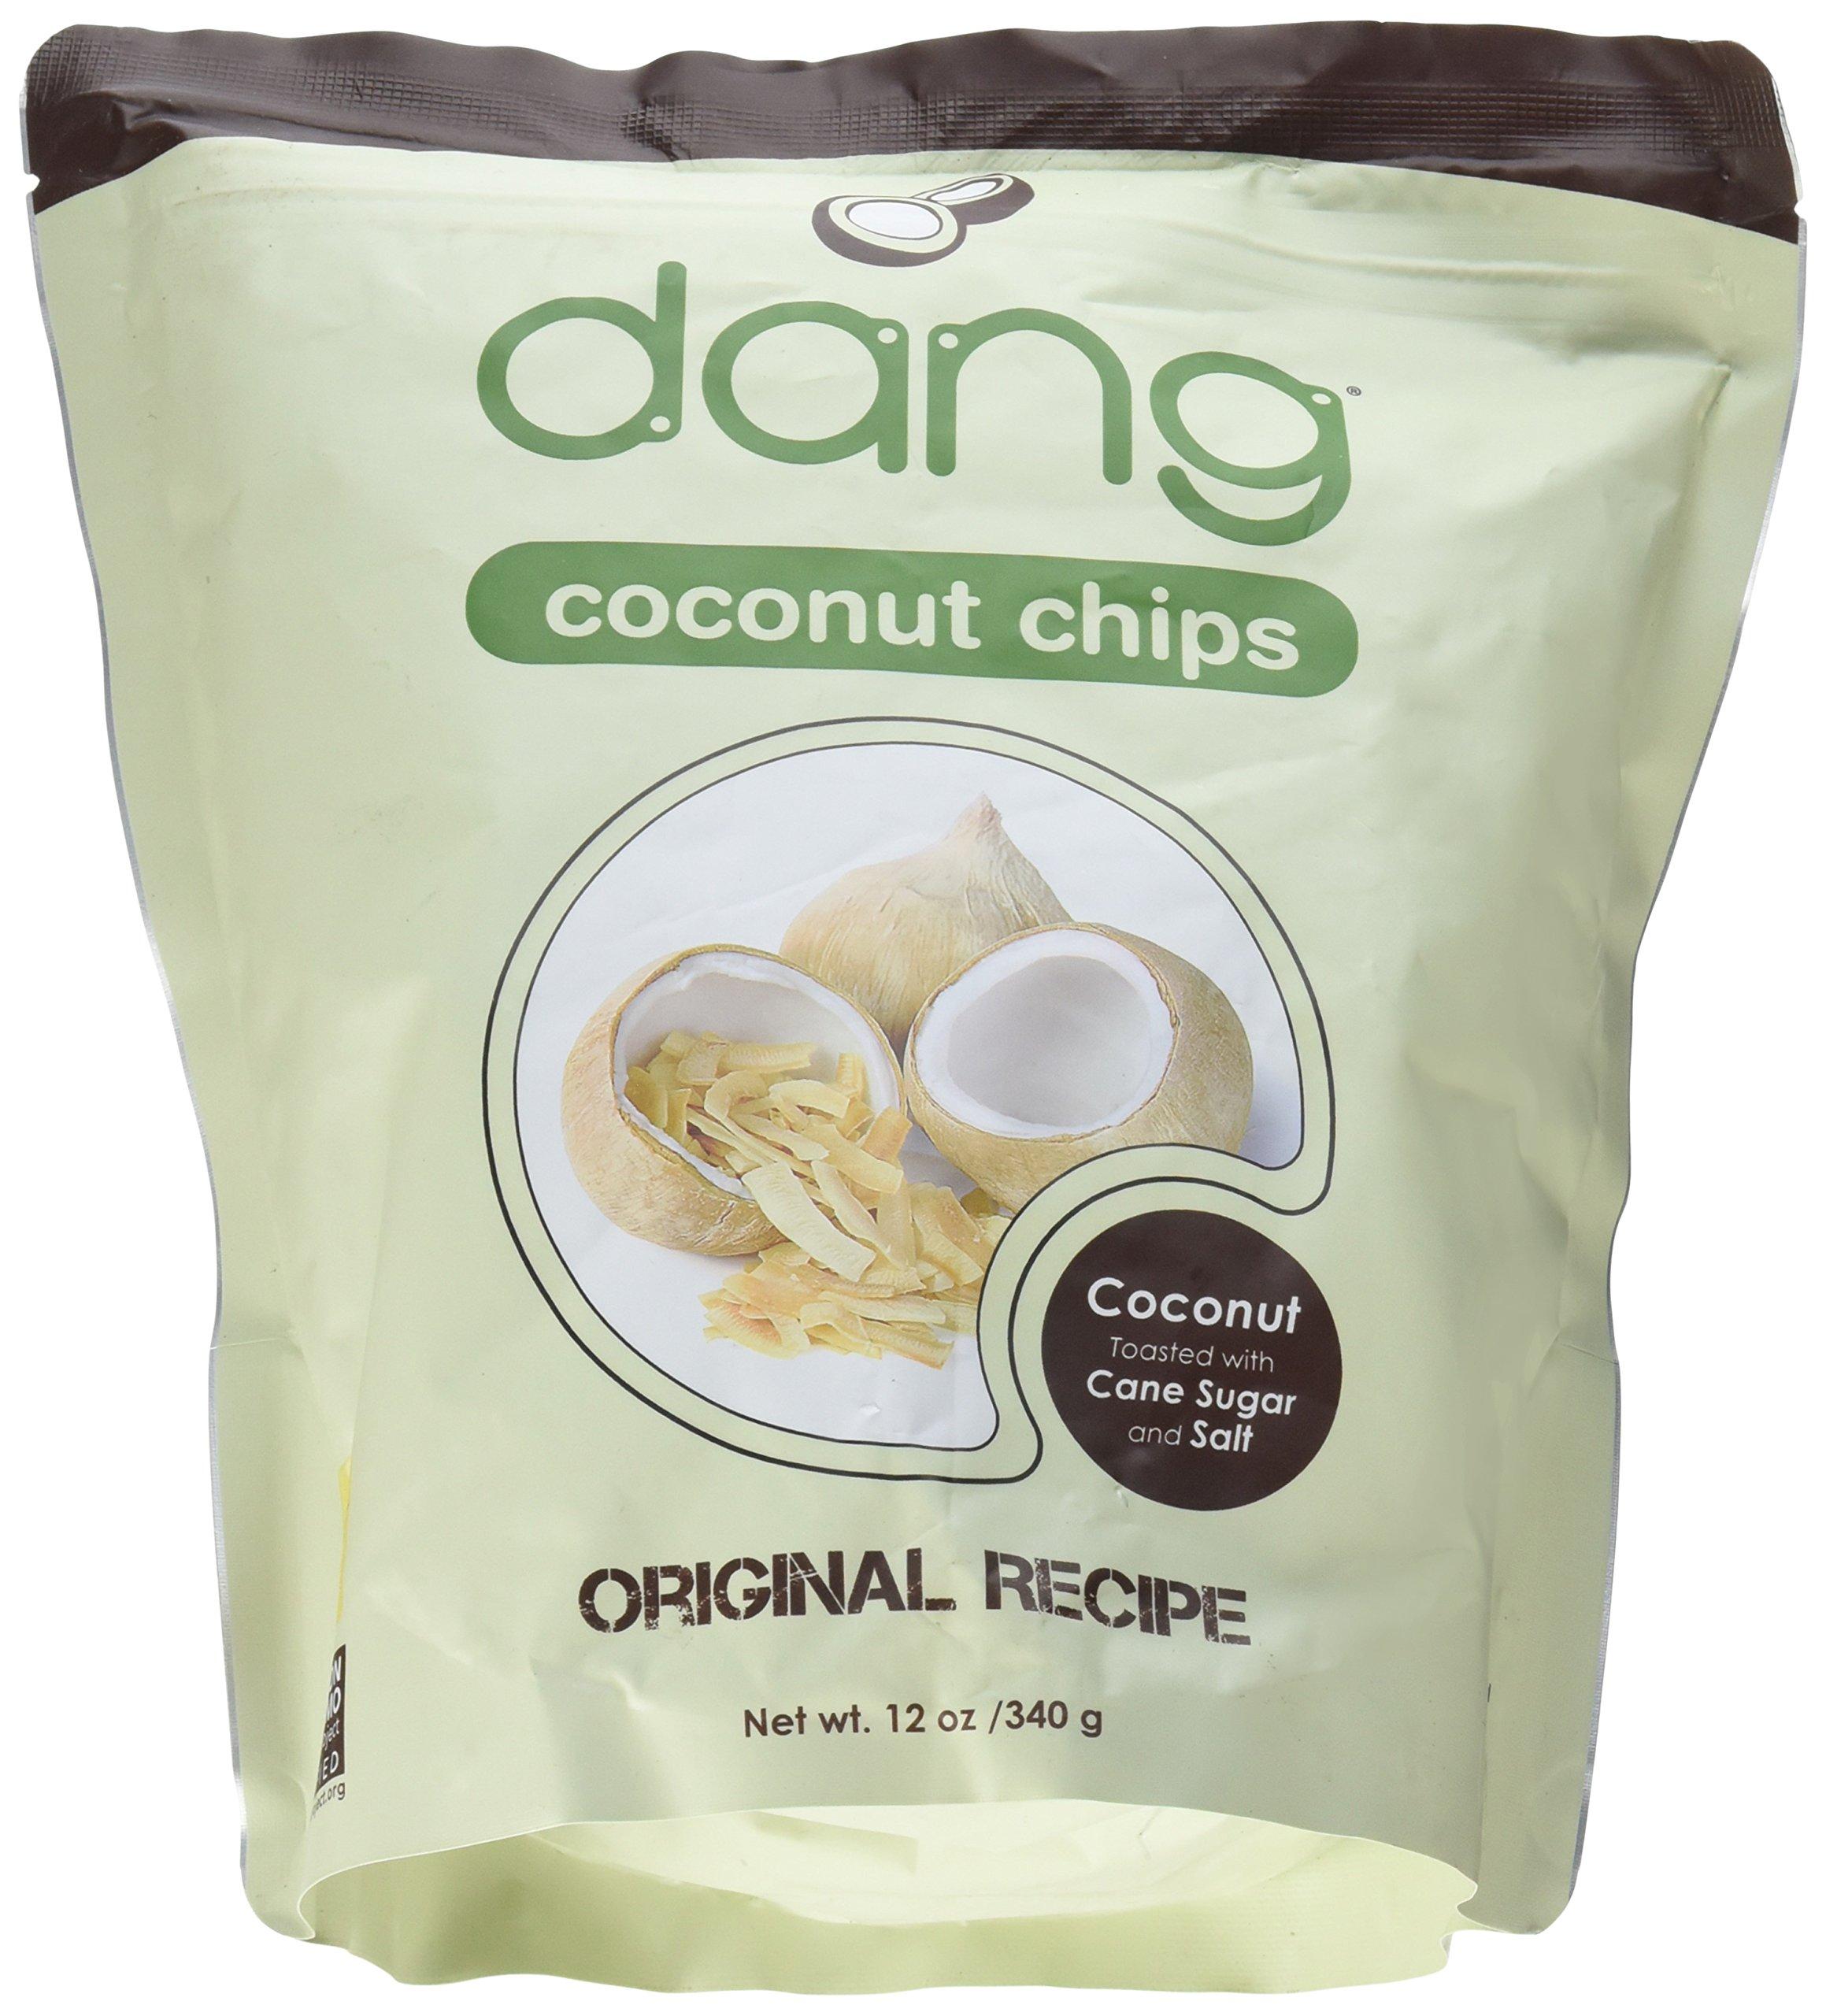 DANG coconut chips 12oz.